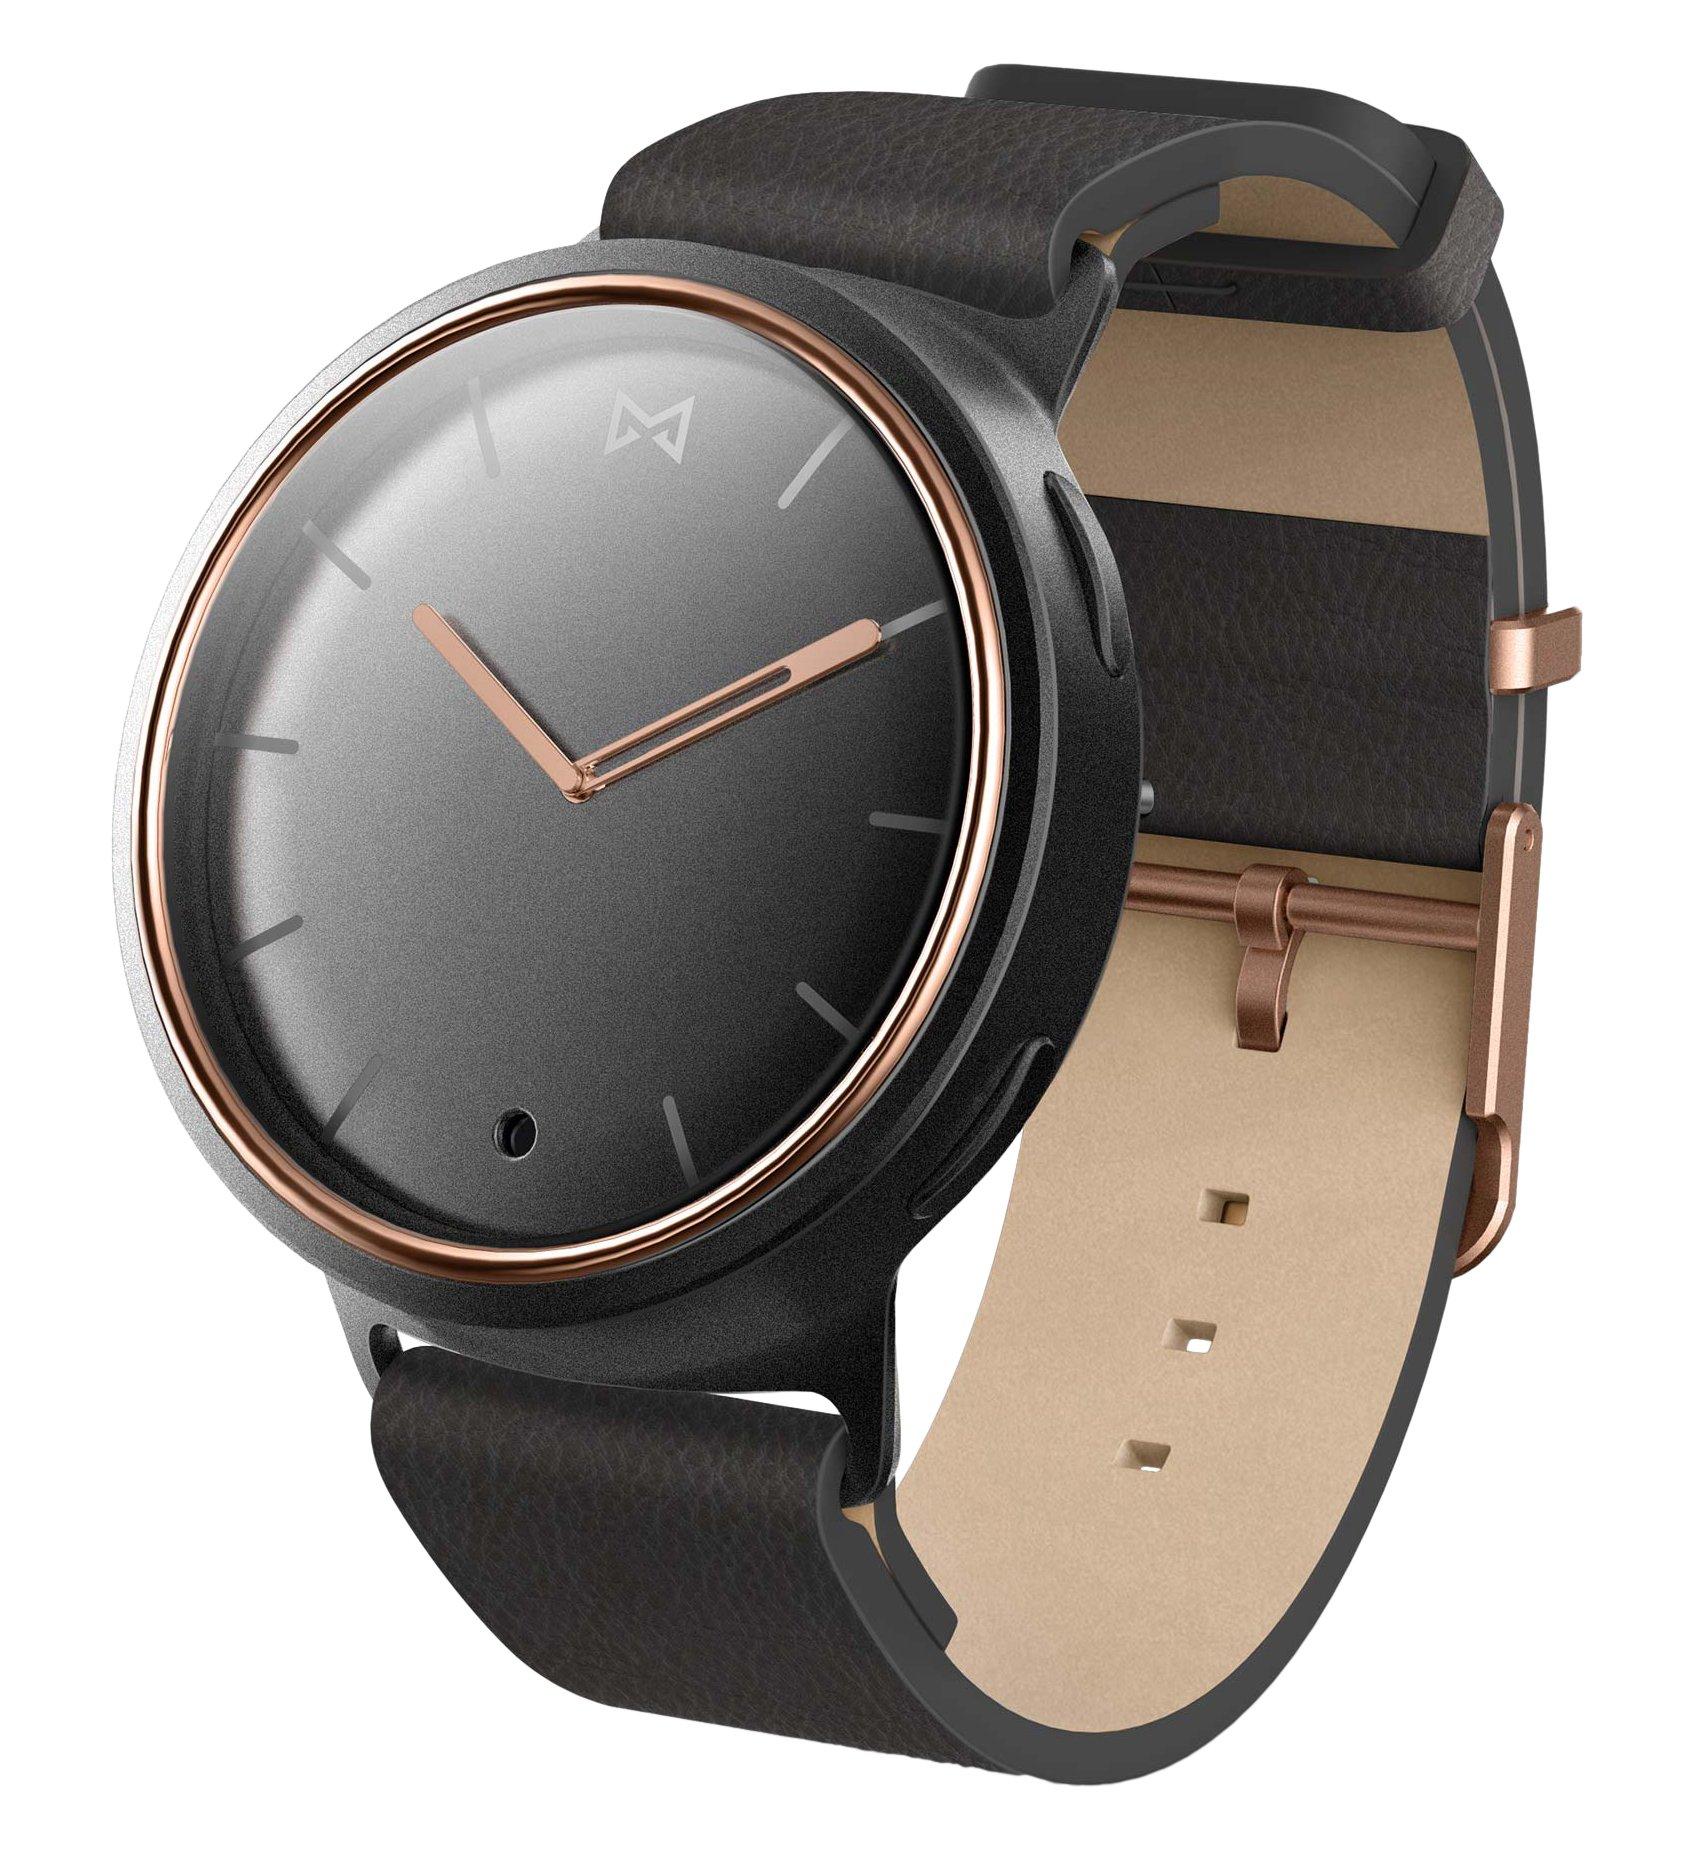 Misfit Phase Hybrid Wearables Smartwatch MIS5002  - Black by Misfit Wearables